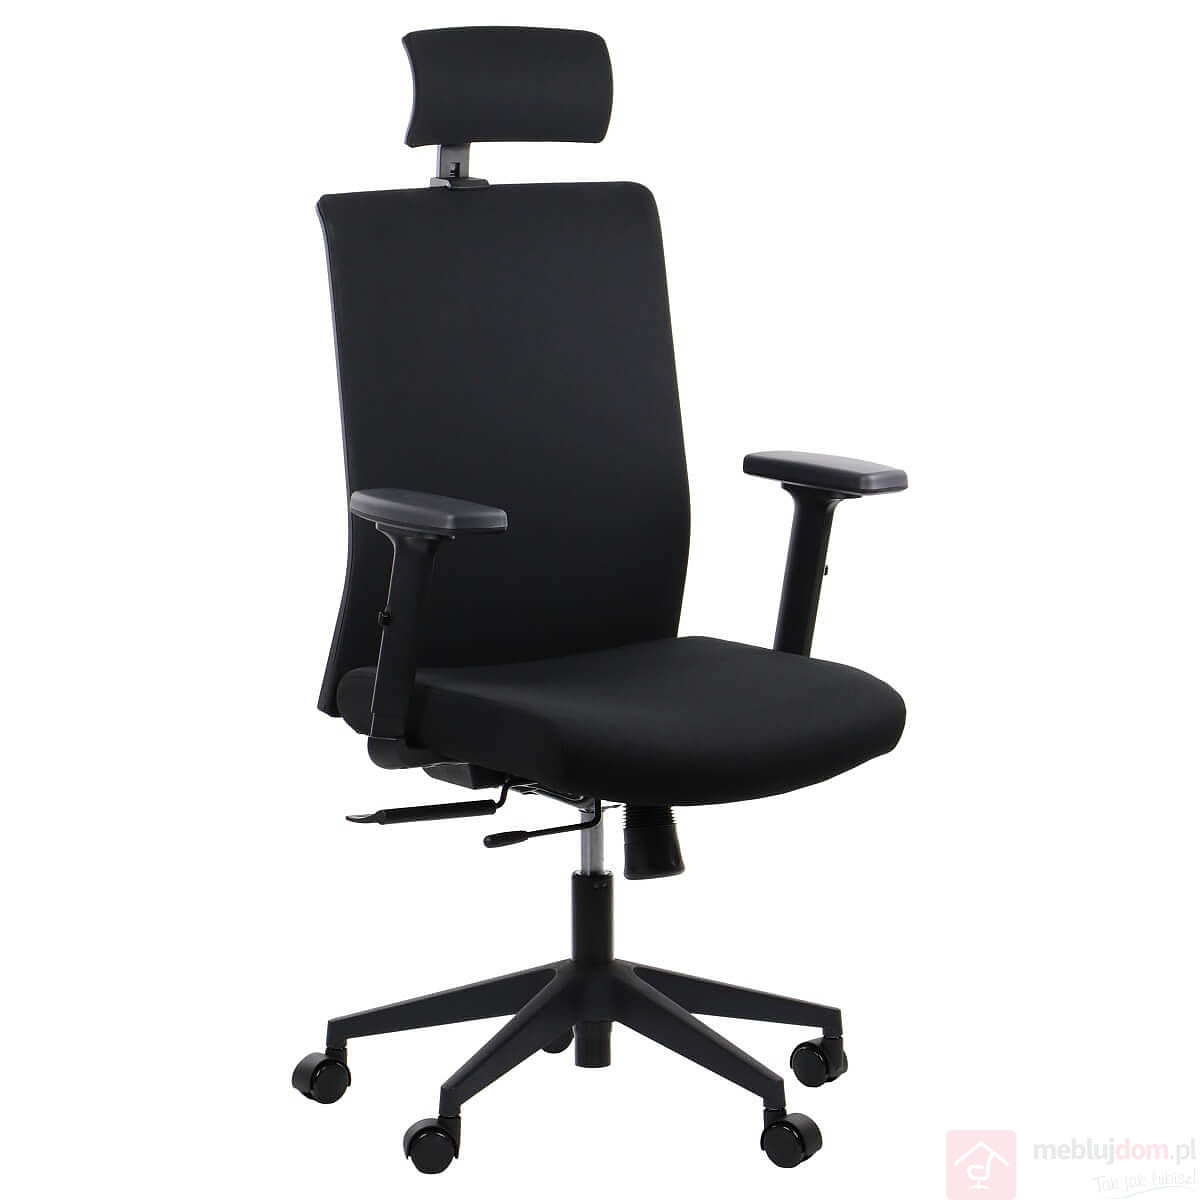 Fotel ergonomiczny ERGON tkanina Sitplus